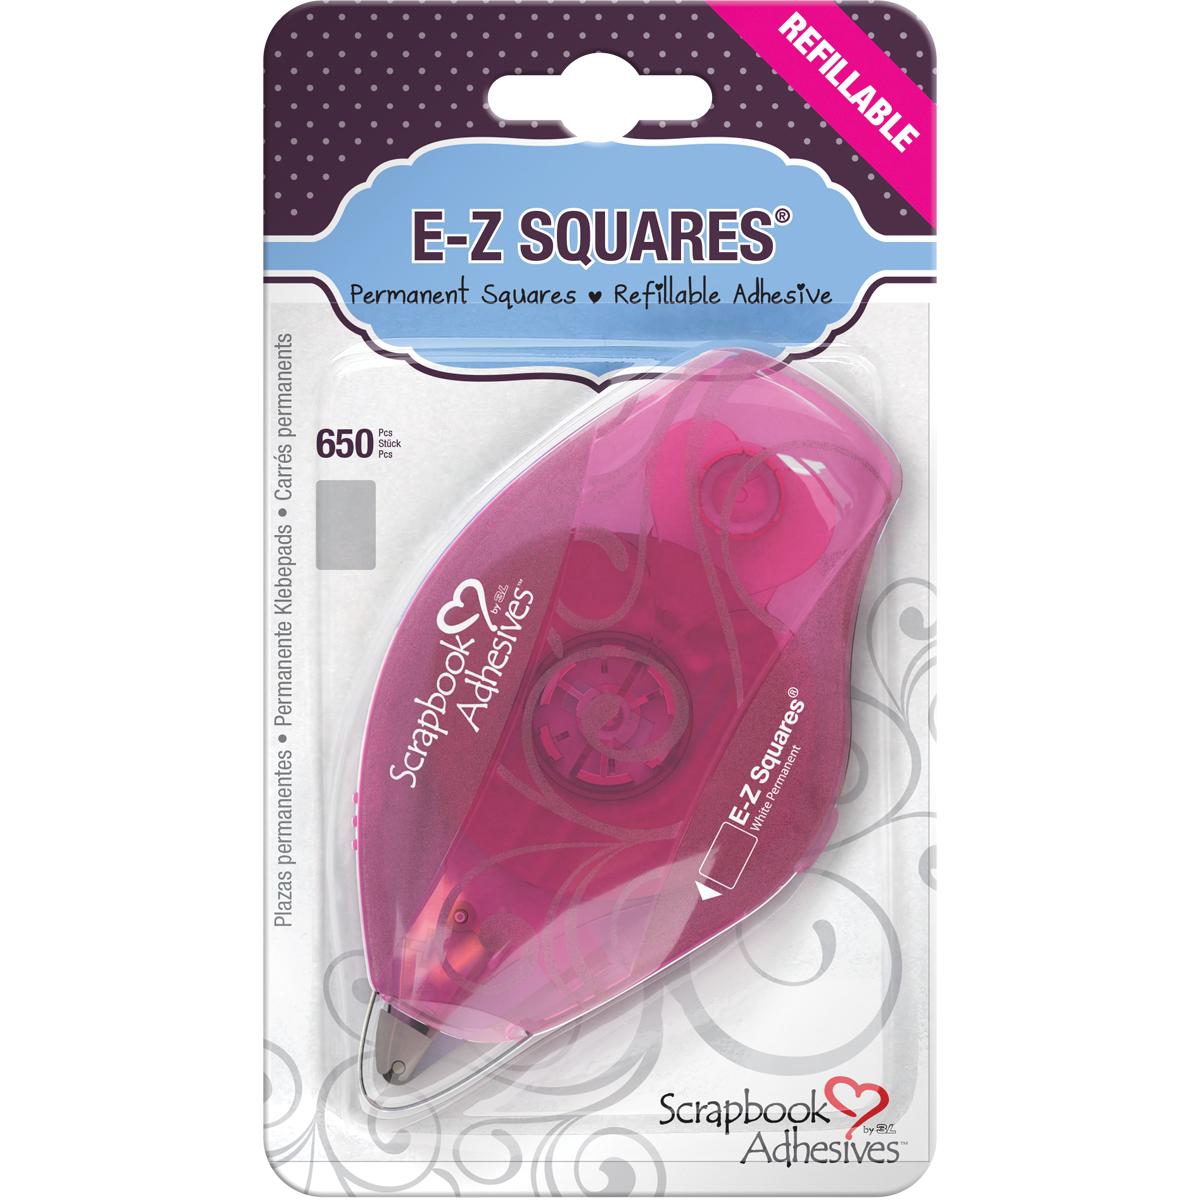 Scrapbook Adhesives E-Z Squares Refillable Dispenser 650/Pkg-Permanent